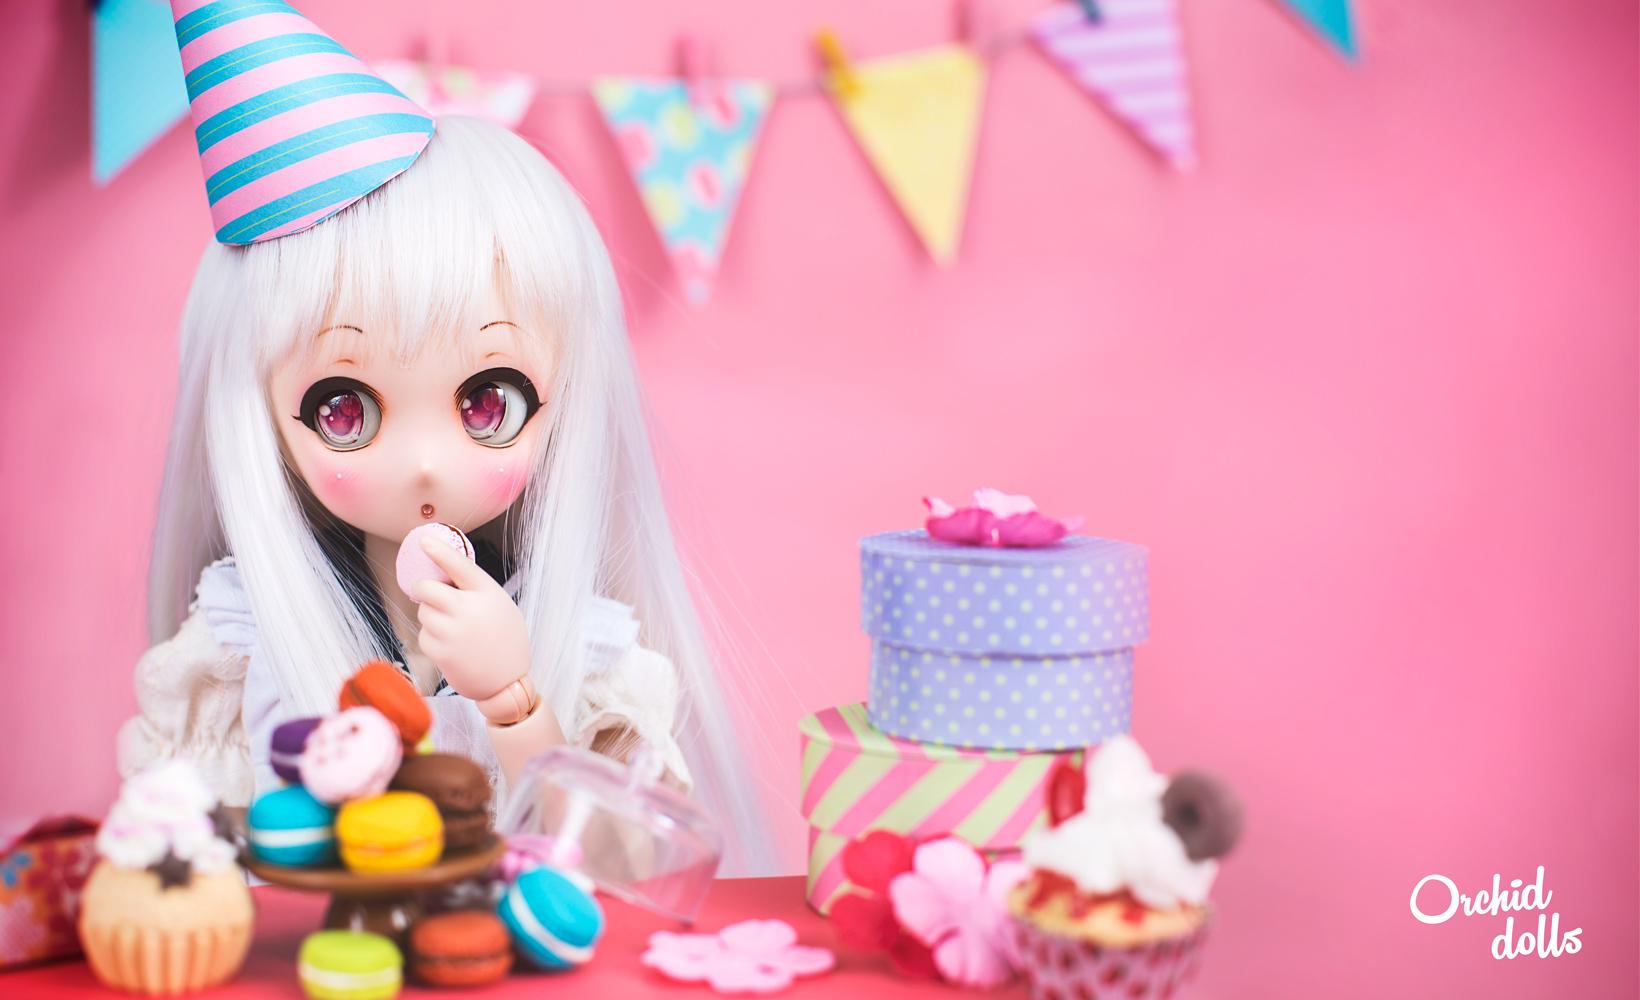 Dollfie Dream comiendo macarons Nebula